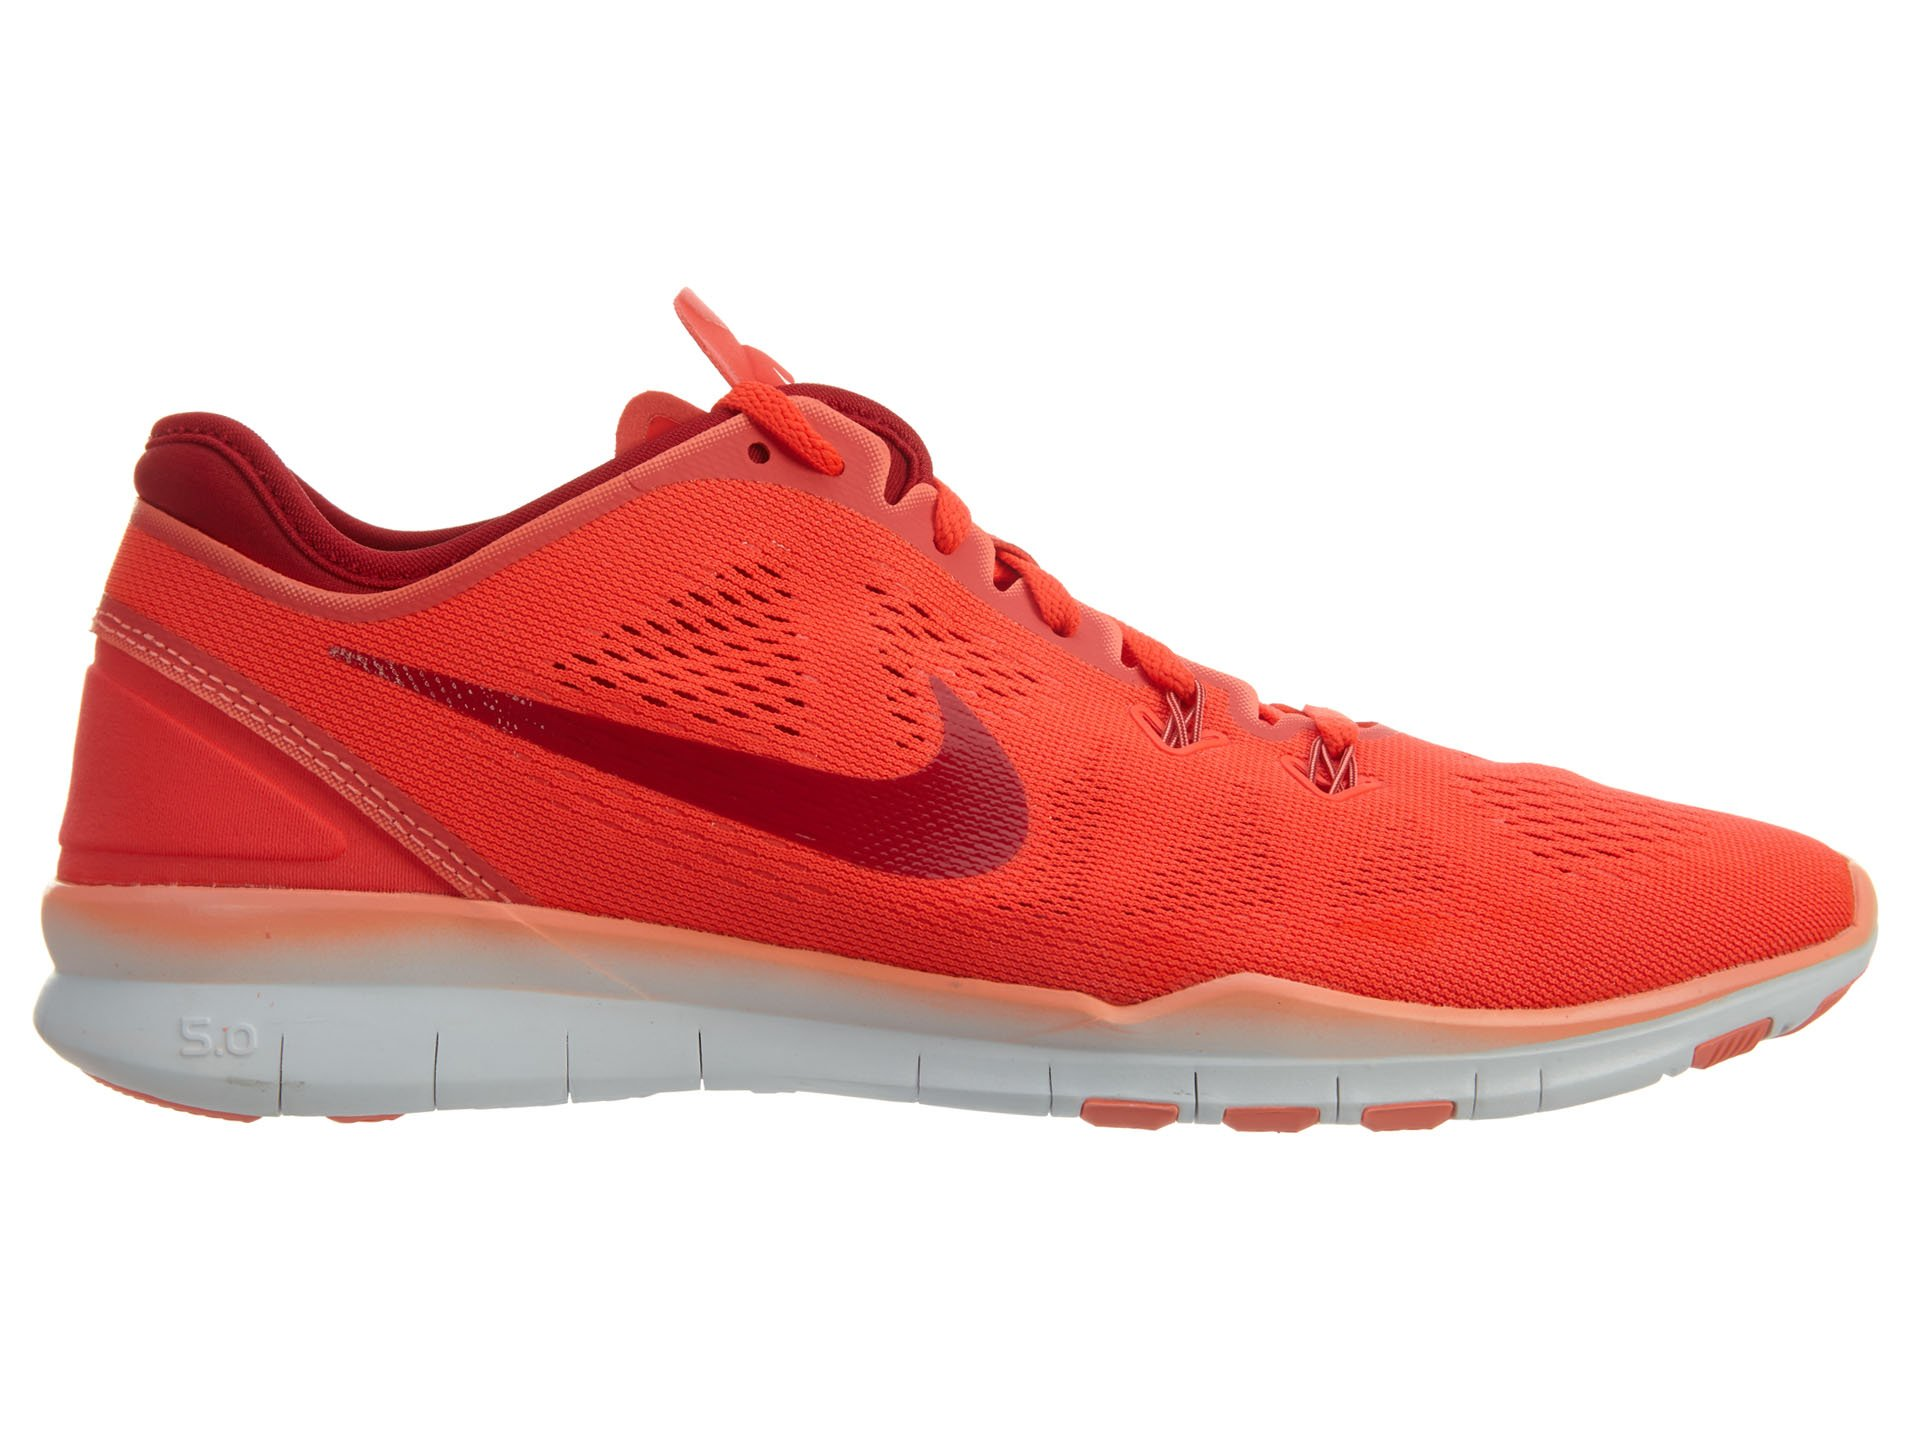 separation shoes 99bdf 79d72 NIKE Women's Free 5.0 TR Fit 5 Bright Crimson/Pink/White 704674-601 (Size:  10)